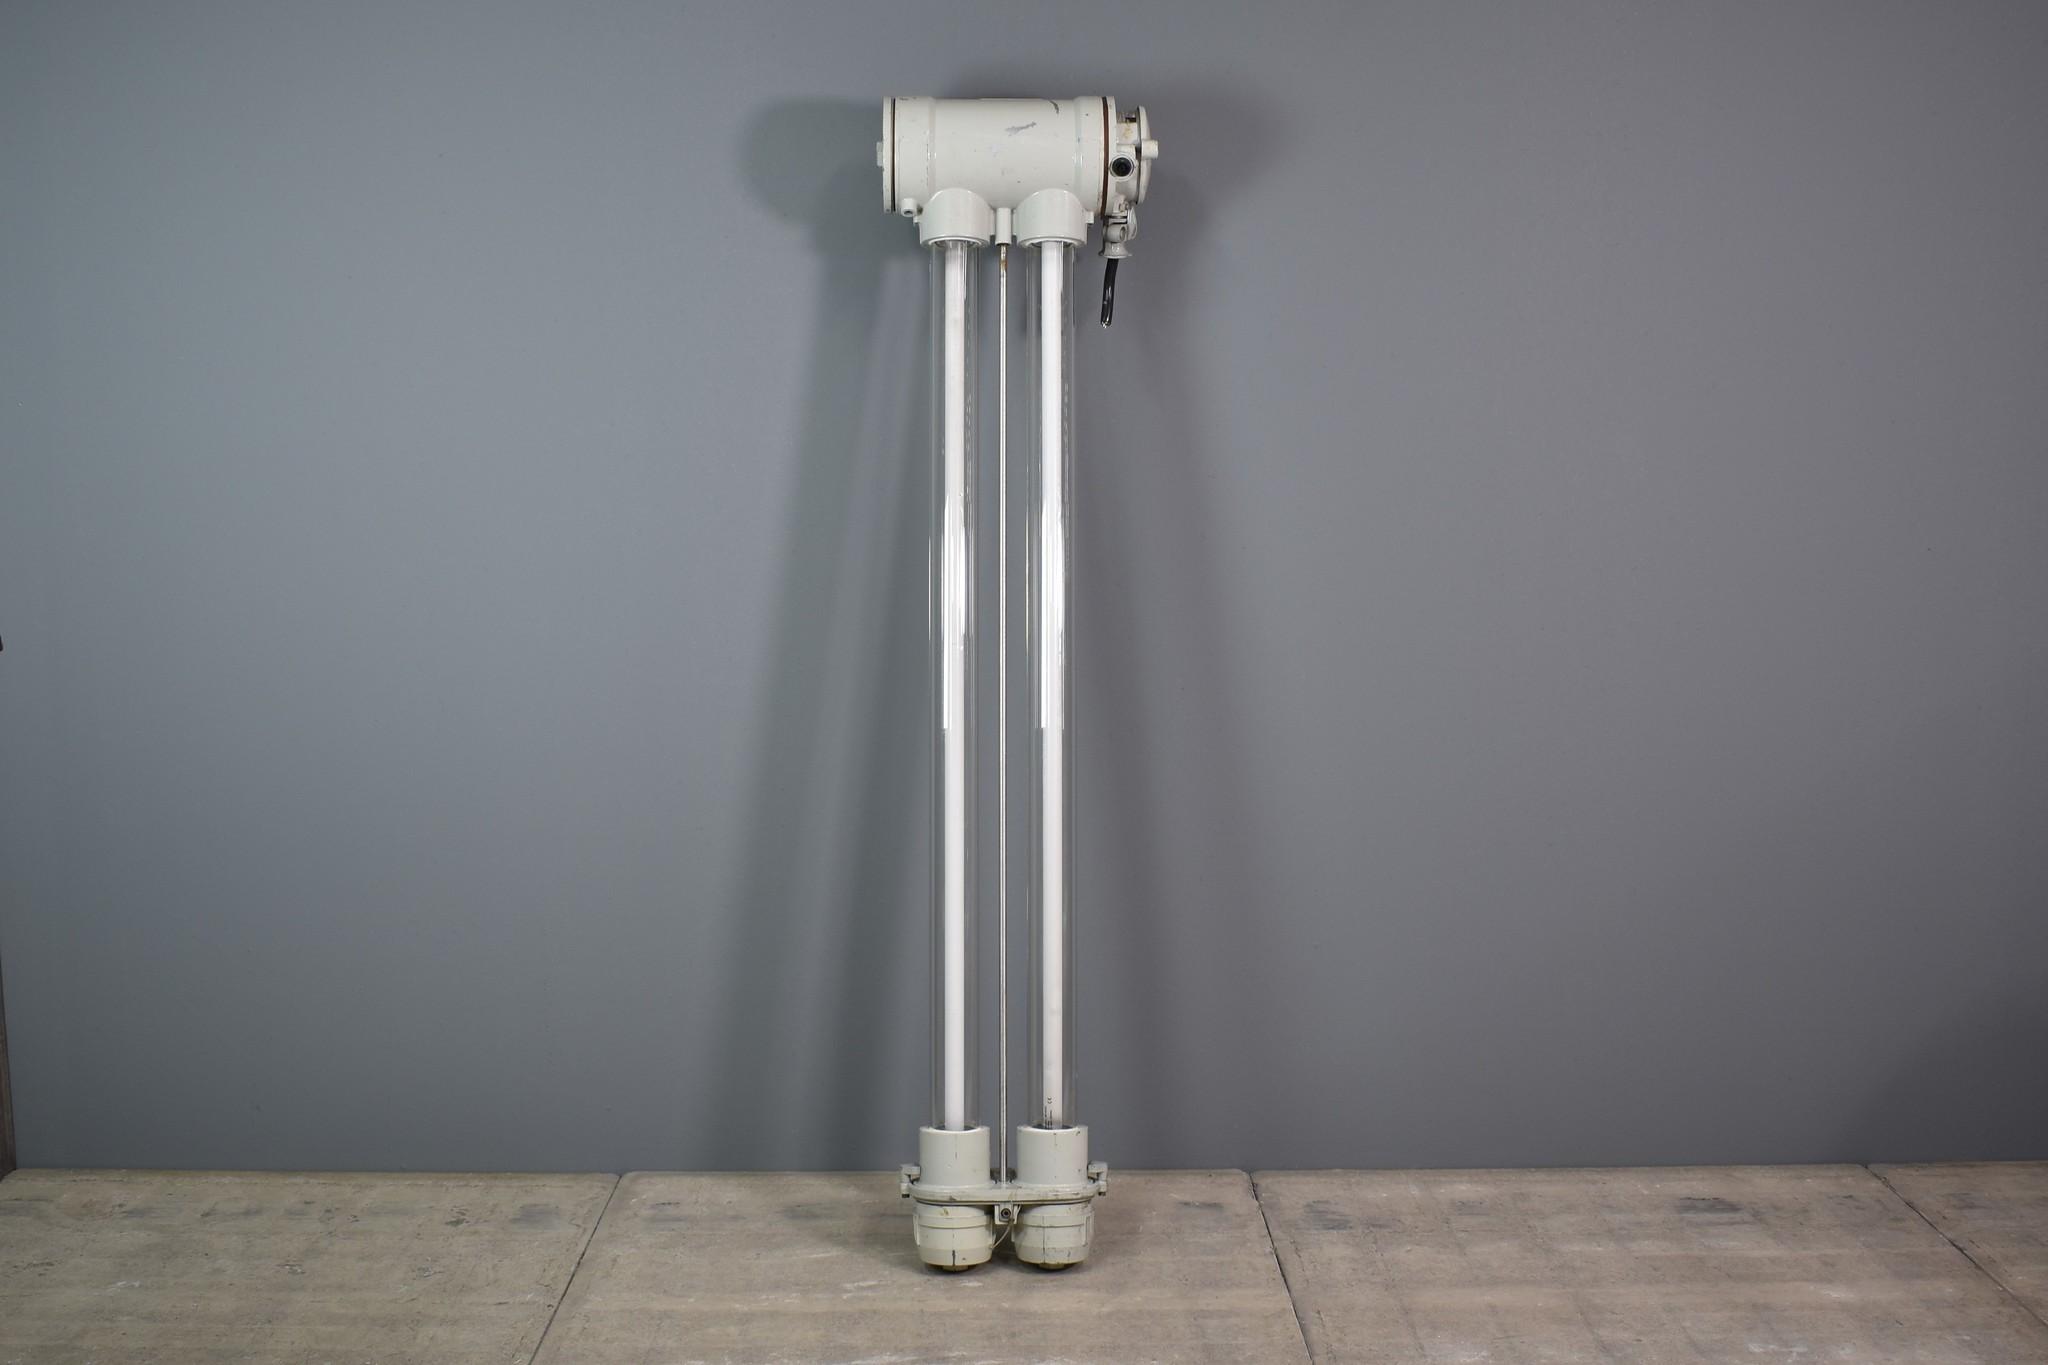 oldwood industriele tl tube dubbele glas